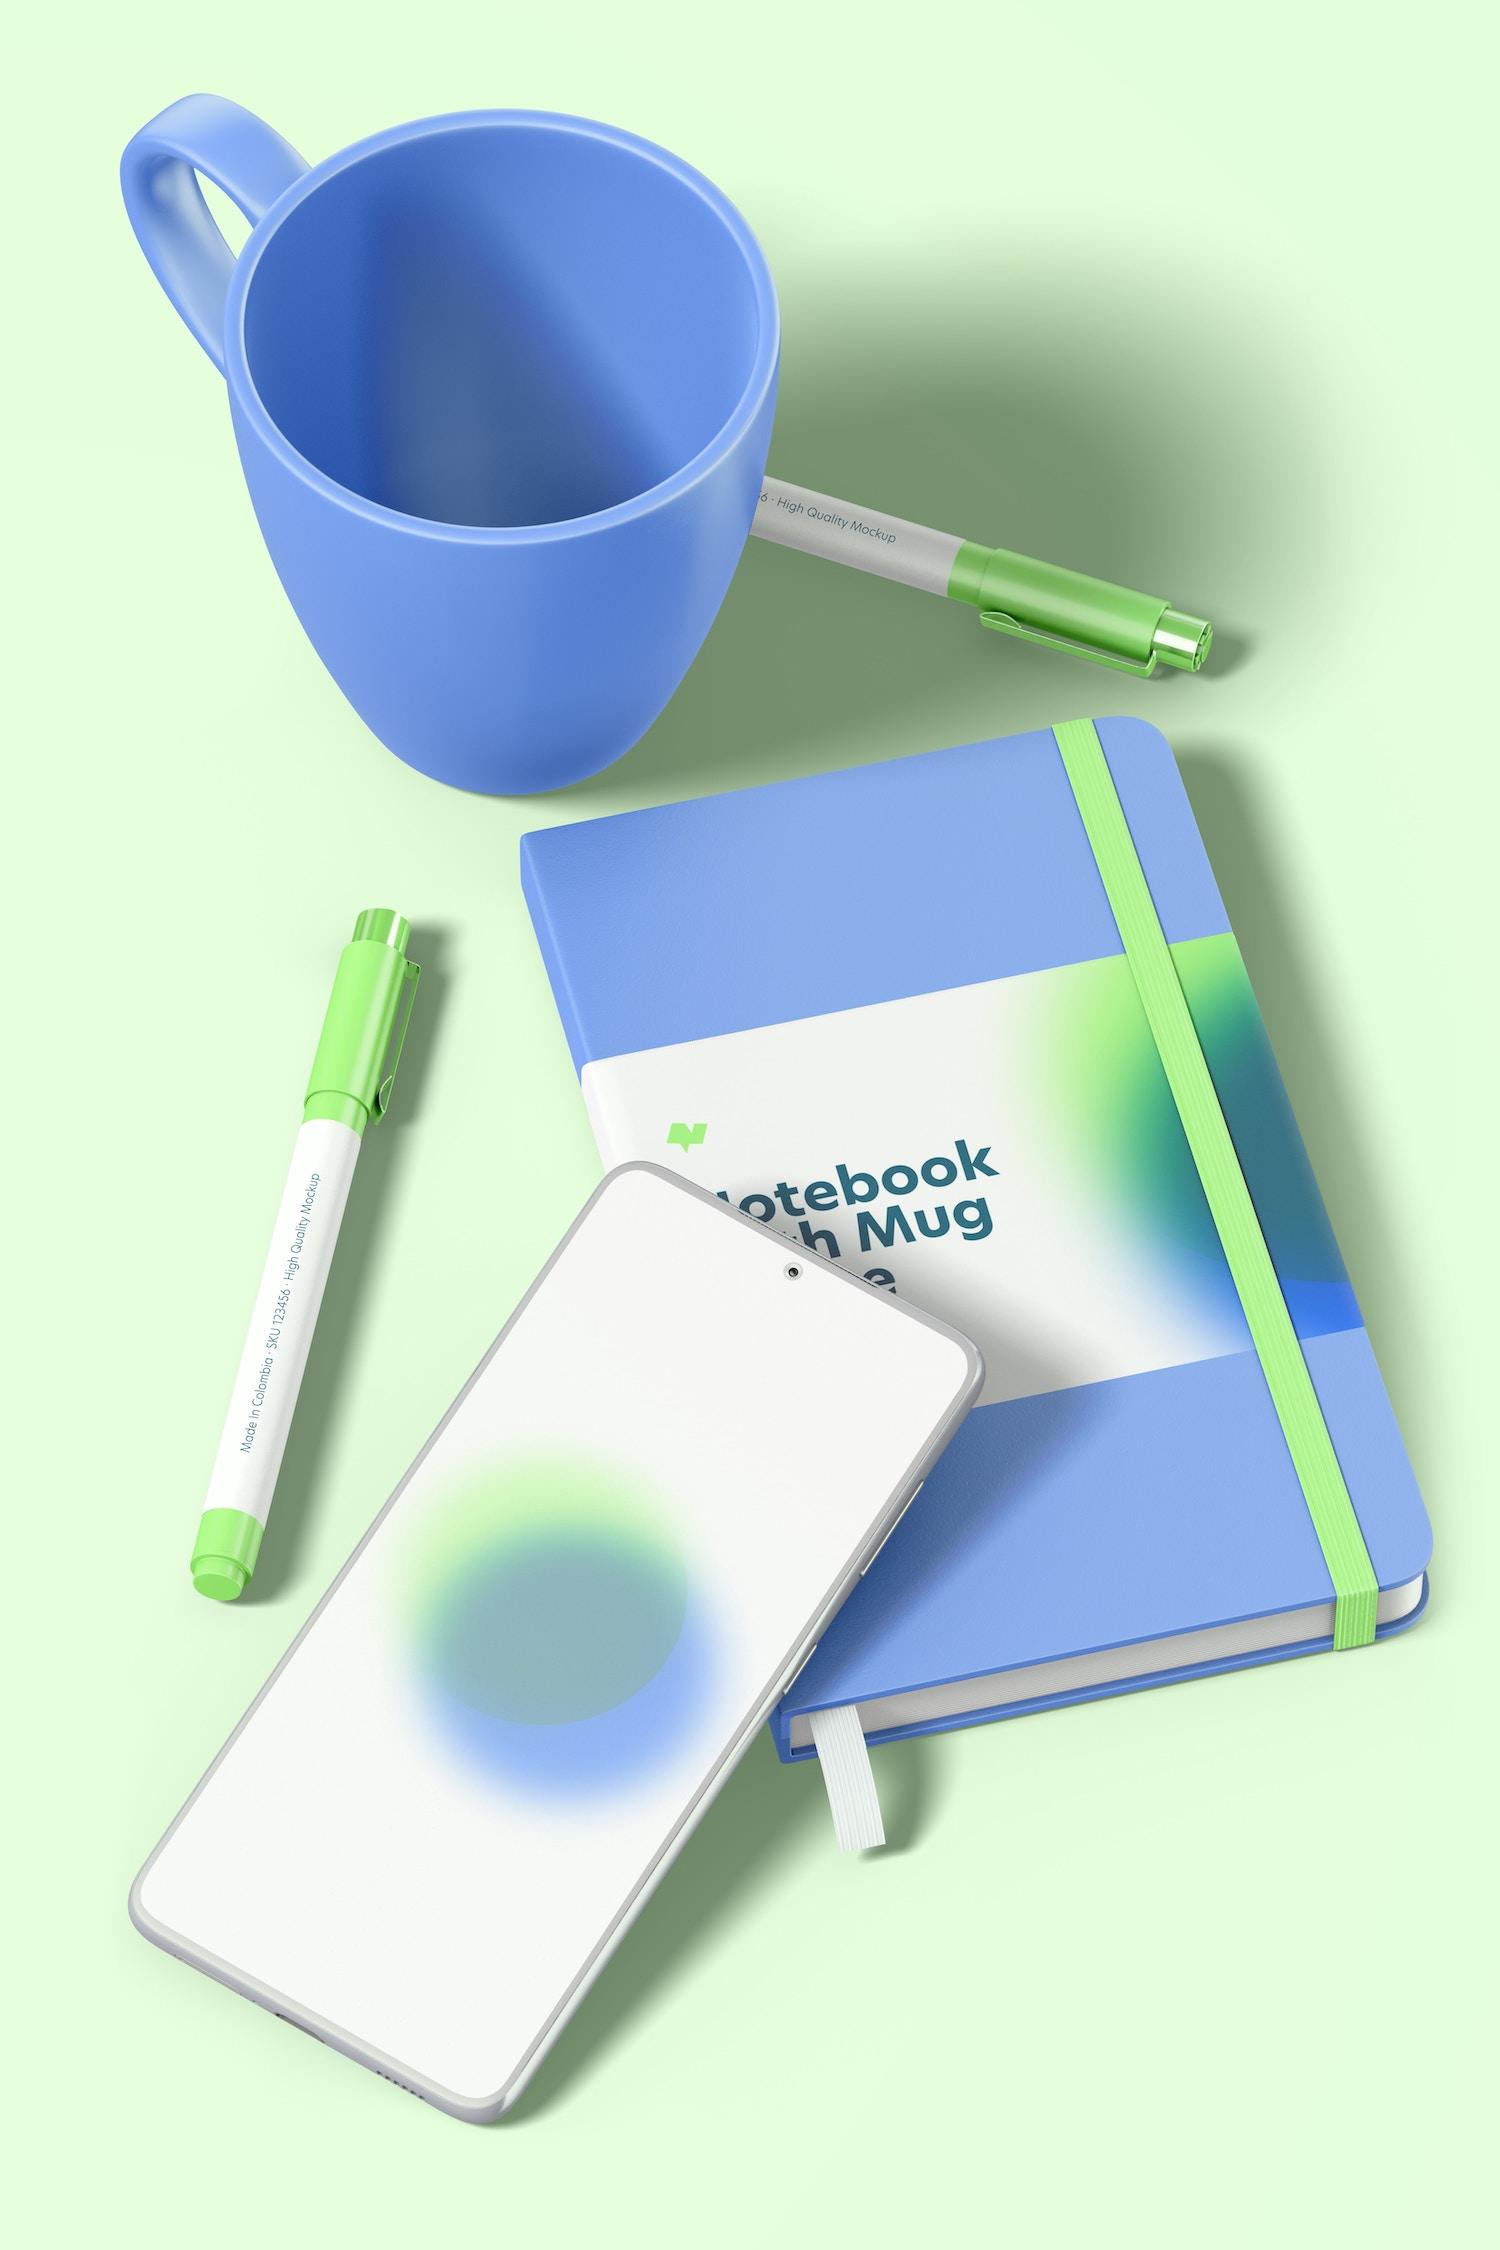 Notebook with Mug Scene Mockup, Top View